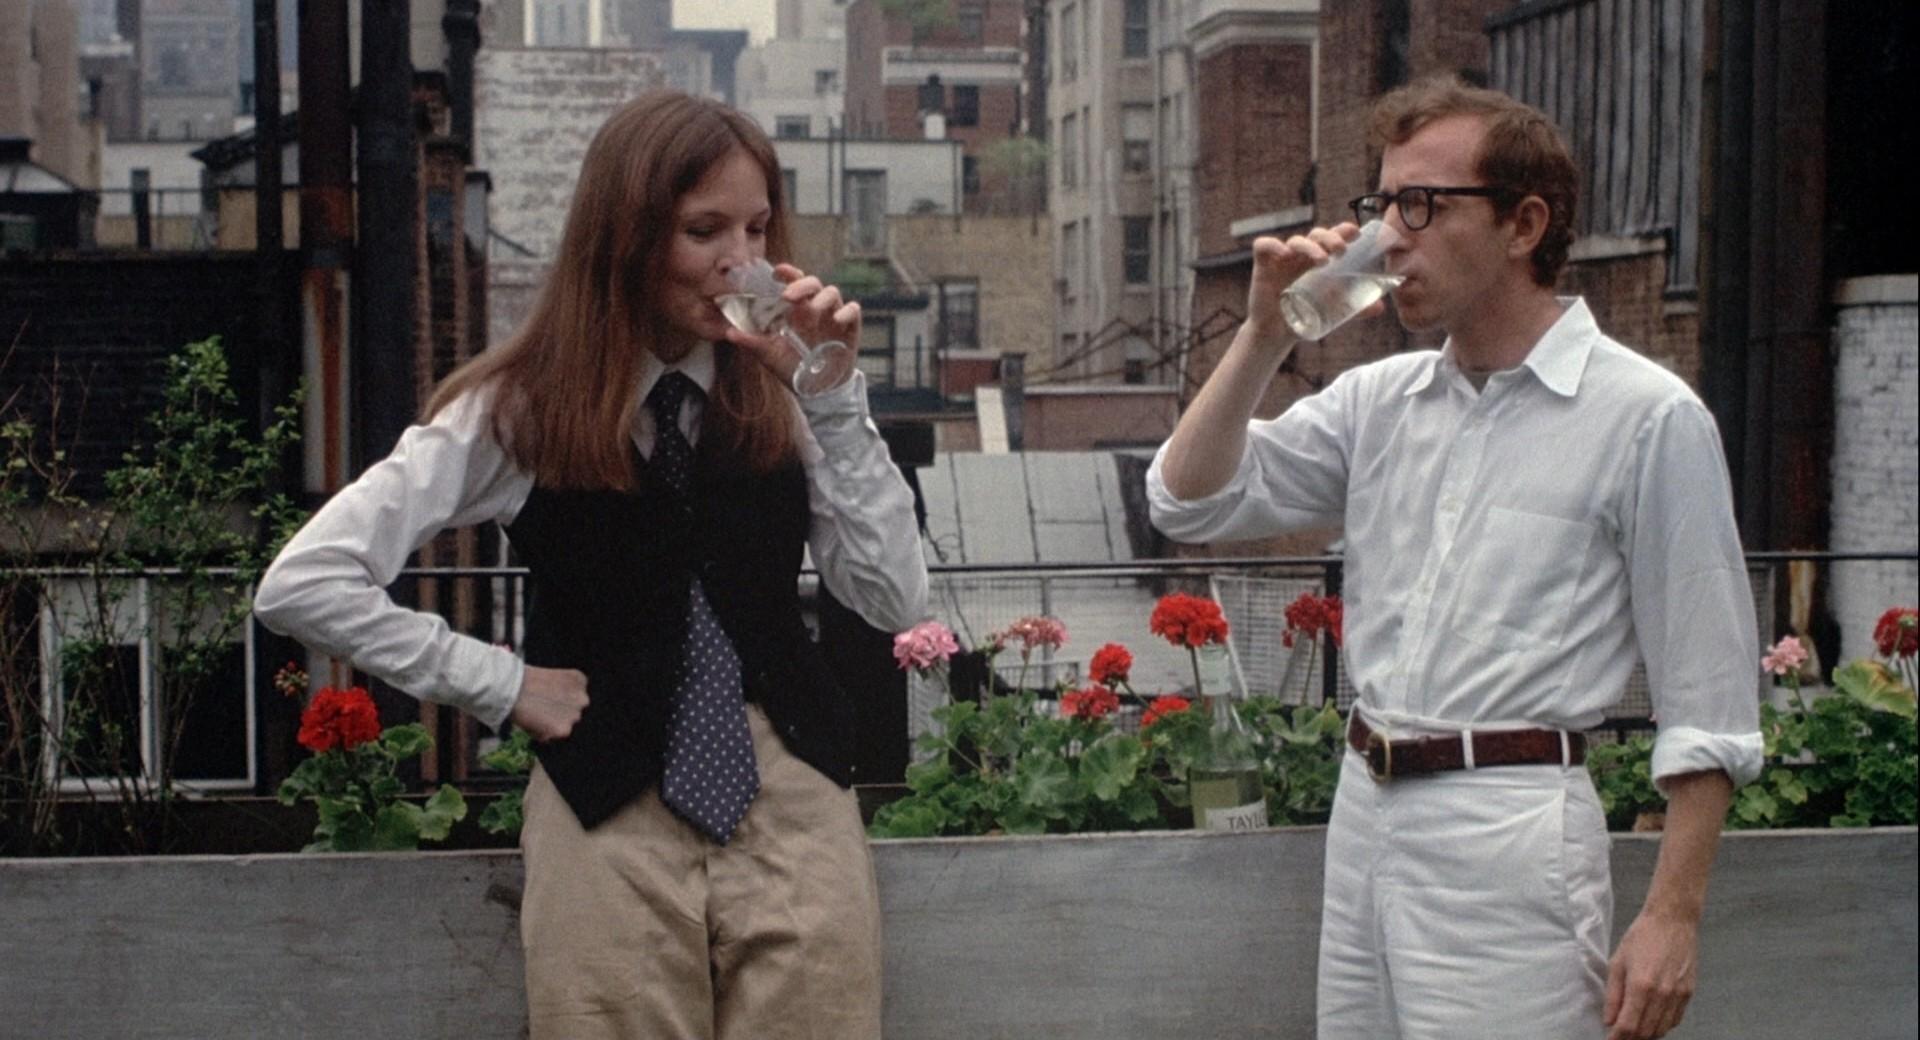 Scene uit de film 'Annie Hall' (1977)